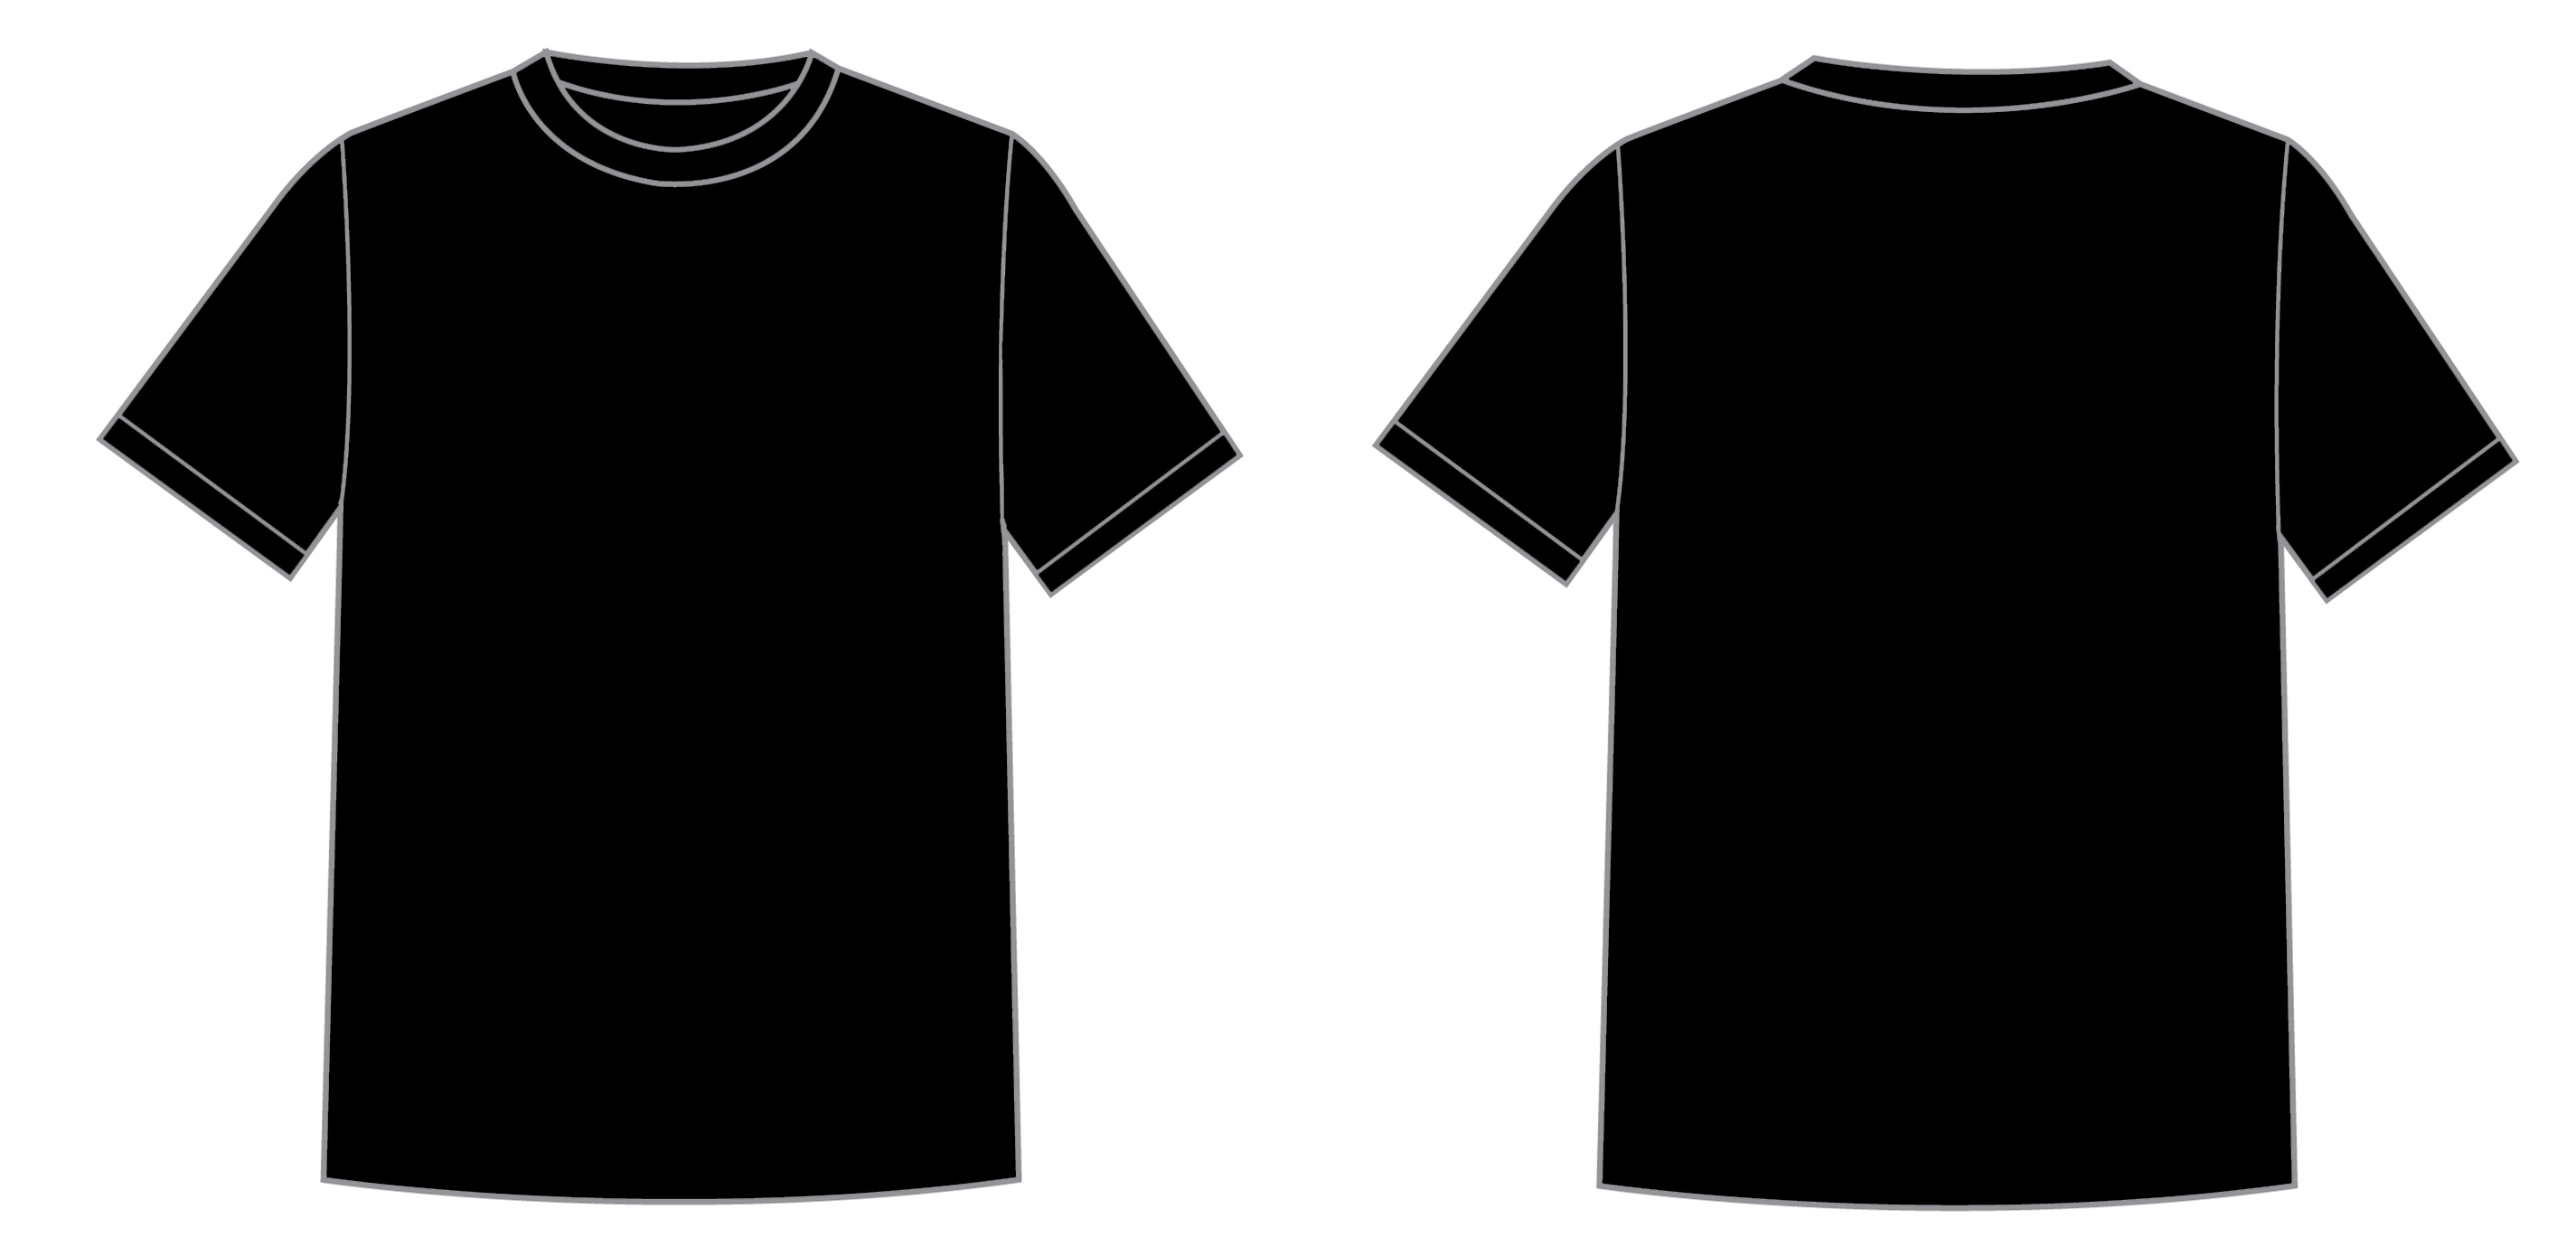 Black t shirt psd template - Black T Shirt Design Template Photoshop Printable T Shirt Template Cliparts Co Download